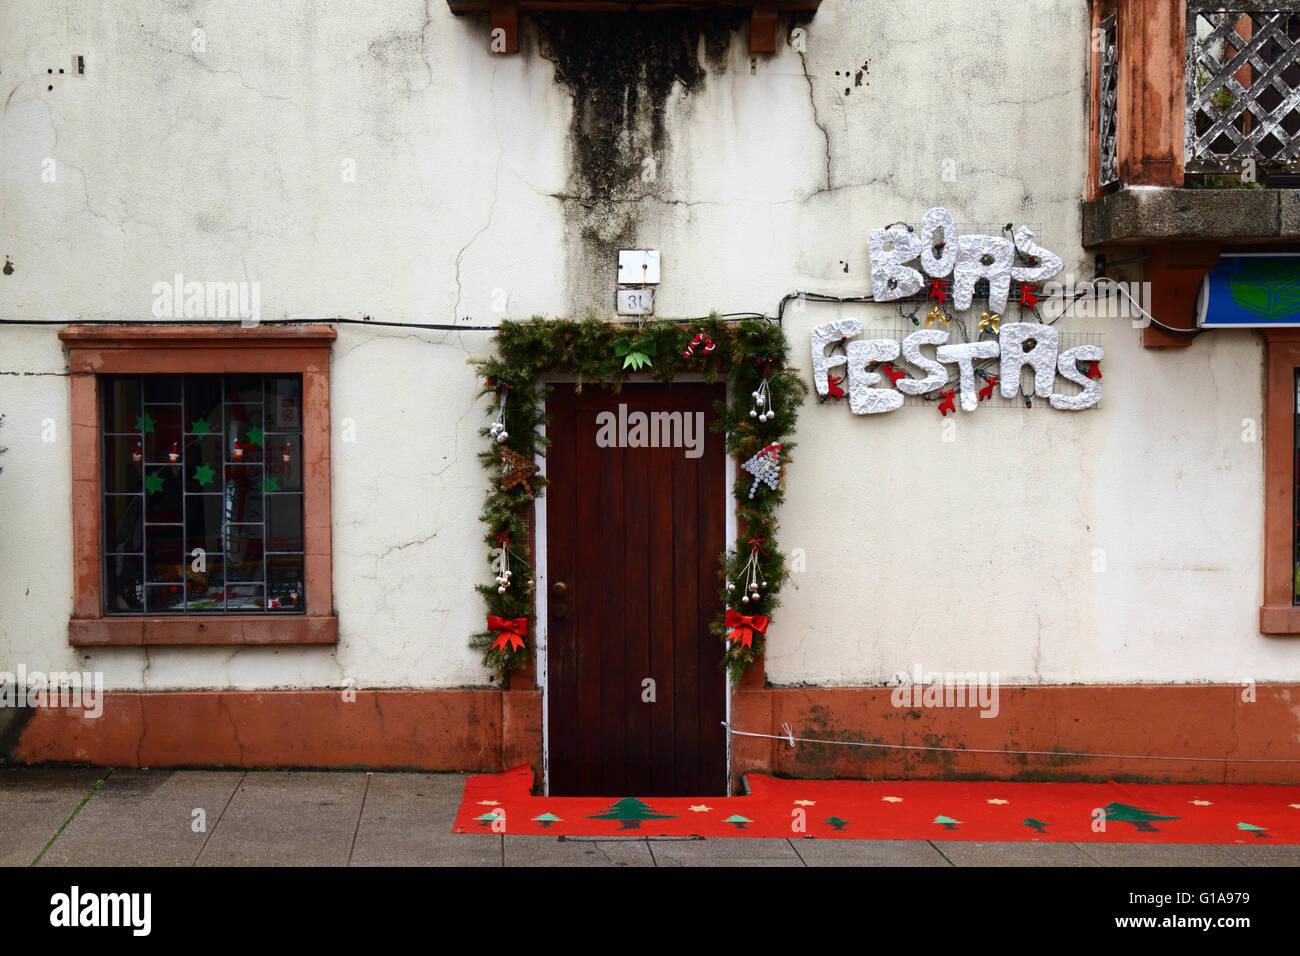 Boas Festas greeting and Christmas decorations outside house, Vila Praia de Ancora, Minho Province, northern Portugal Stock Photo